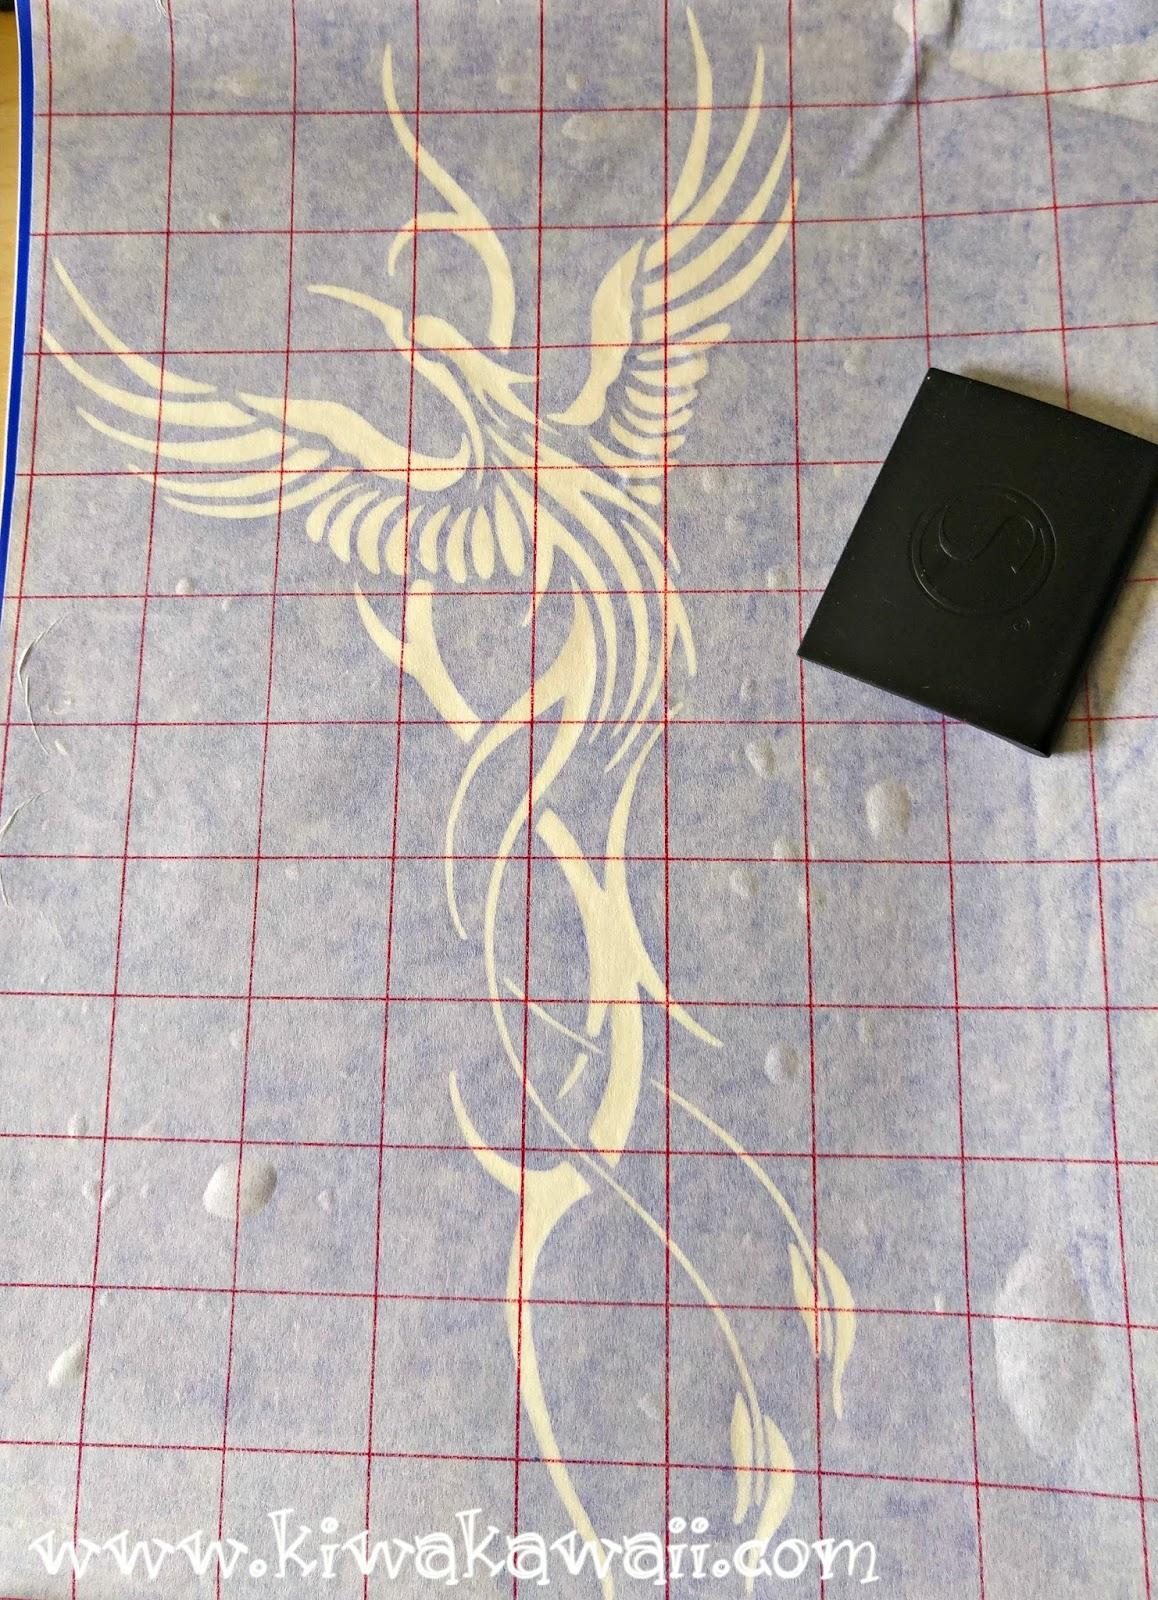 Tutorial: Pintar con pintura en spray usando plantilla - Kiwa Kawaii